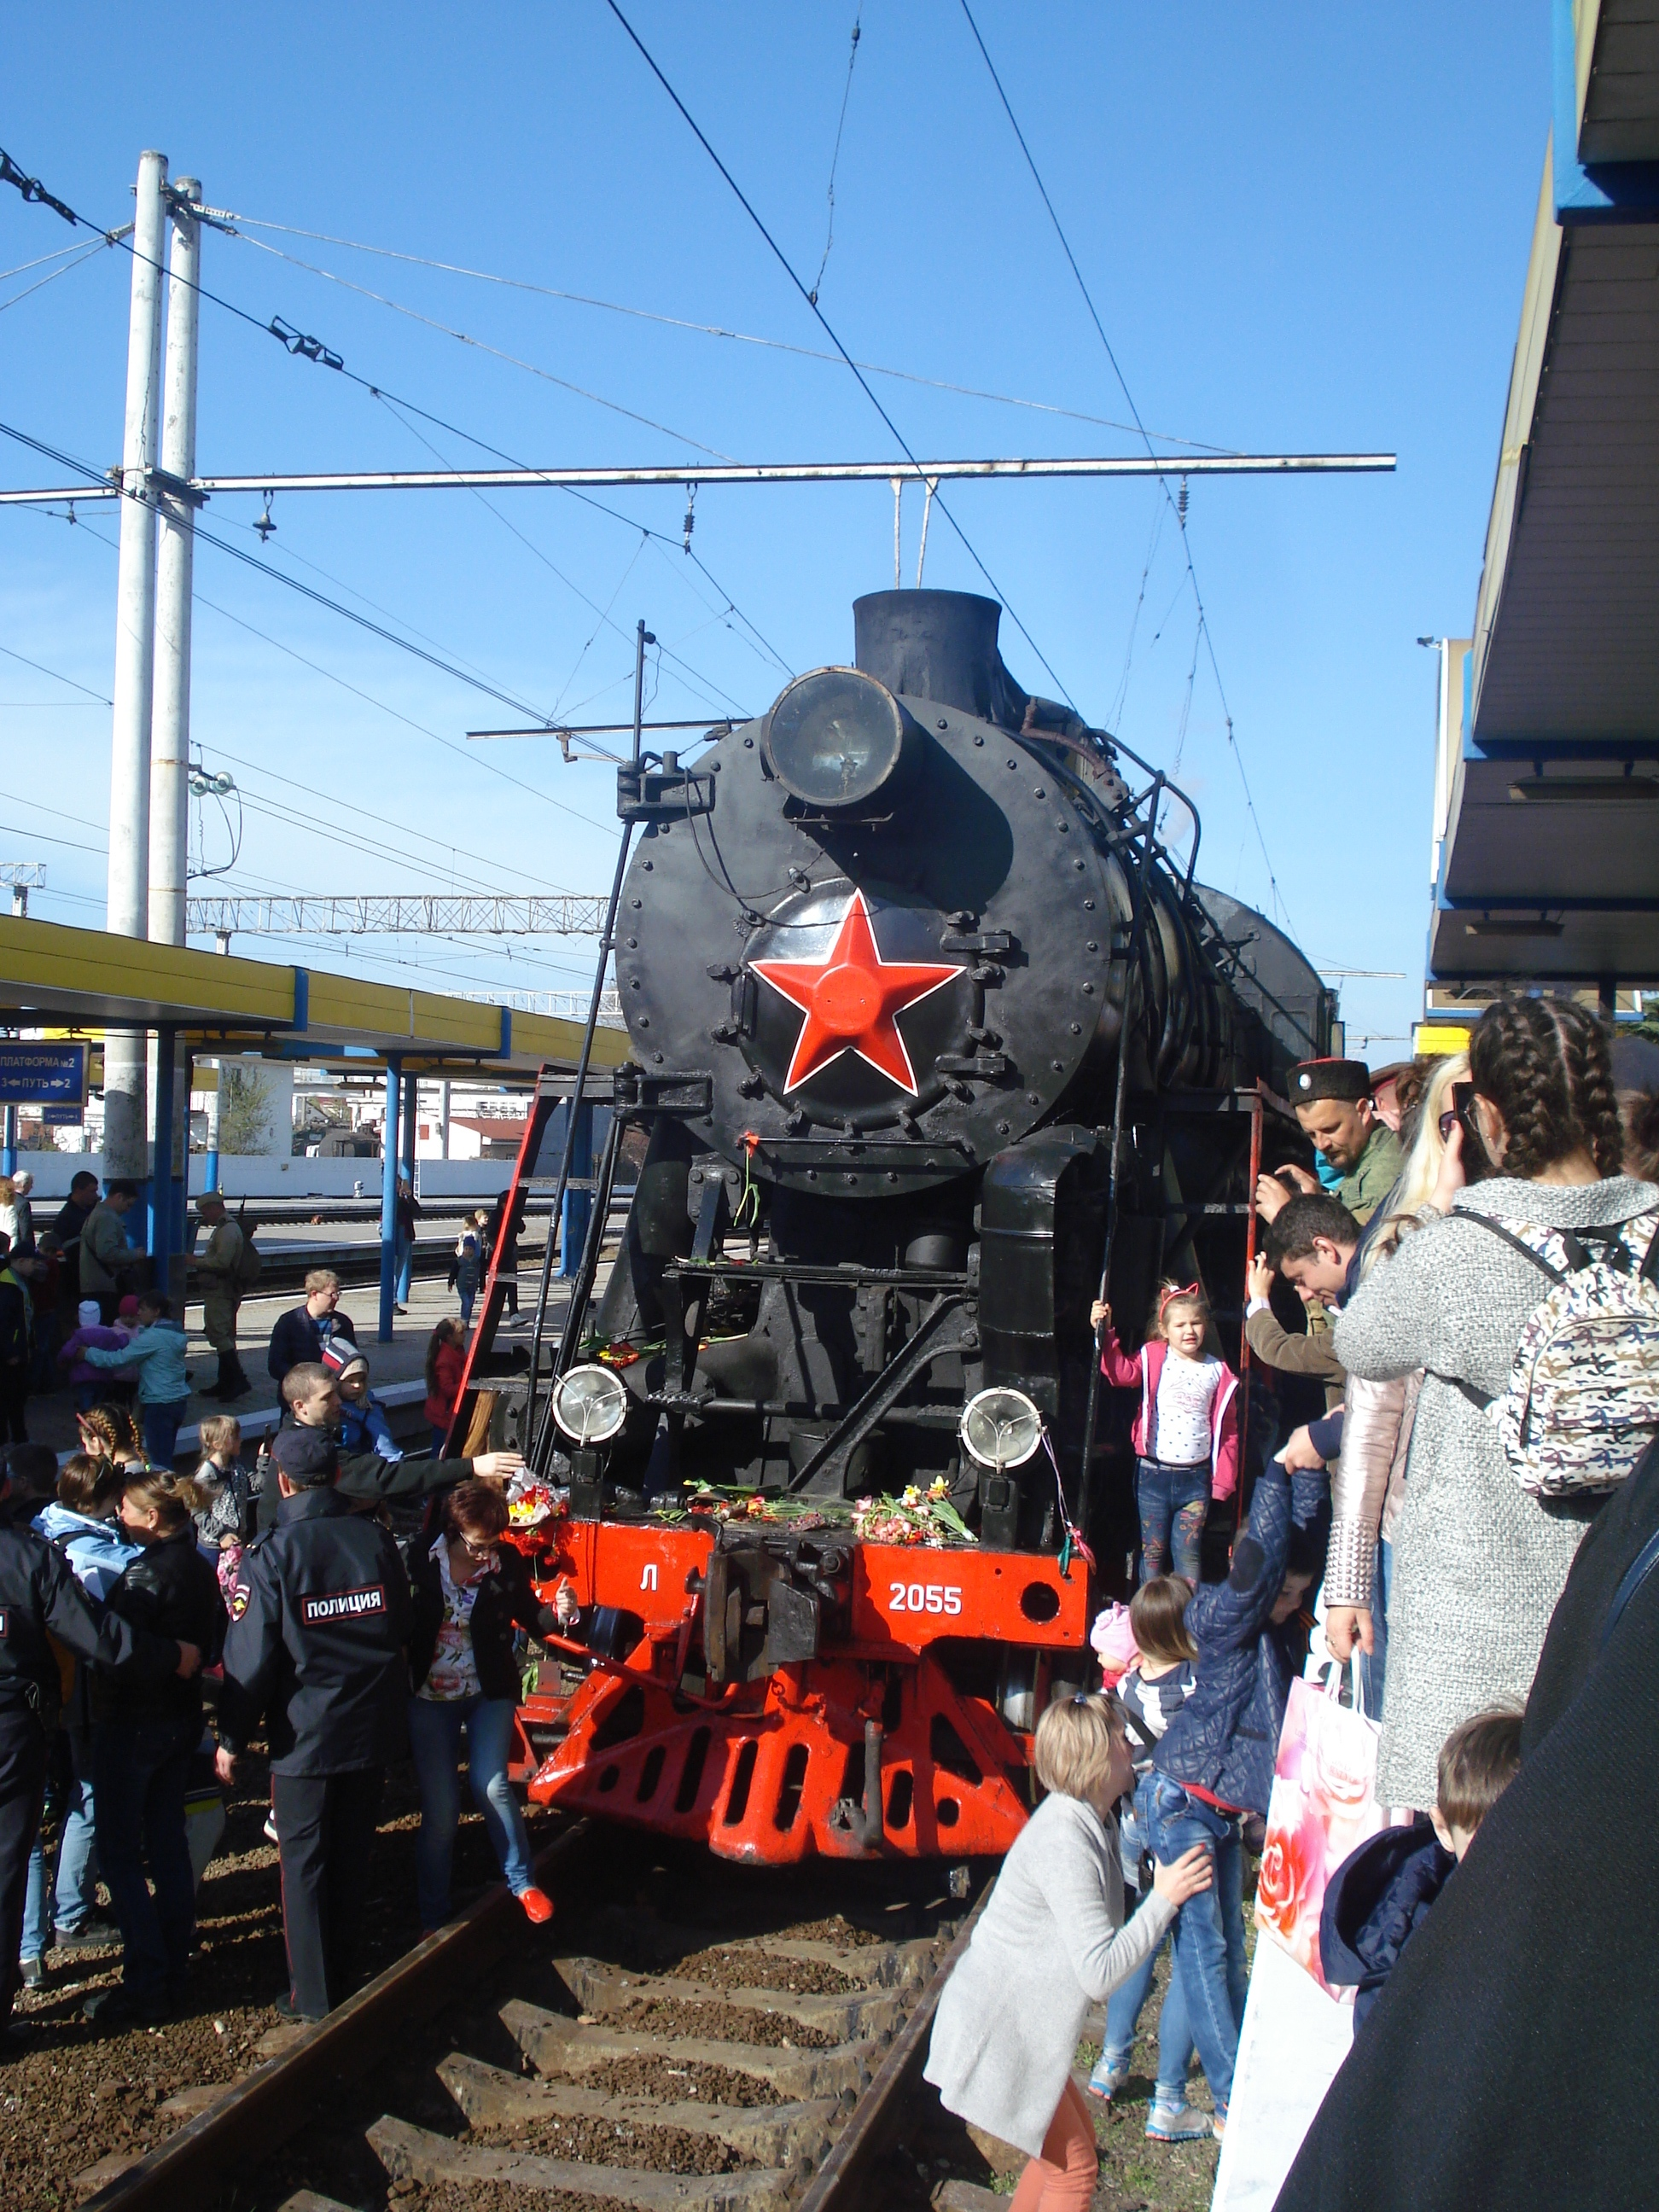 https://img-fotki.yandex.ru/get/194869/38146243.2e/0_d5df0_f71415e1_orig.jpg